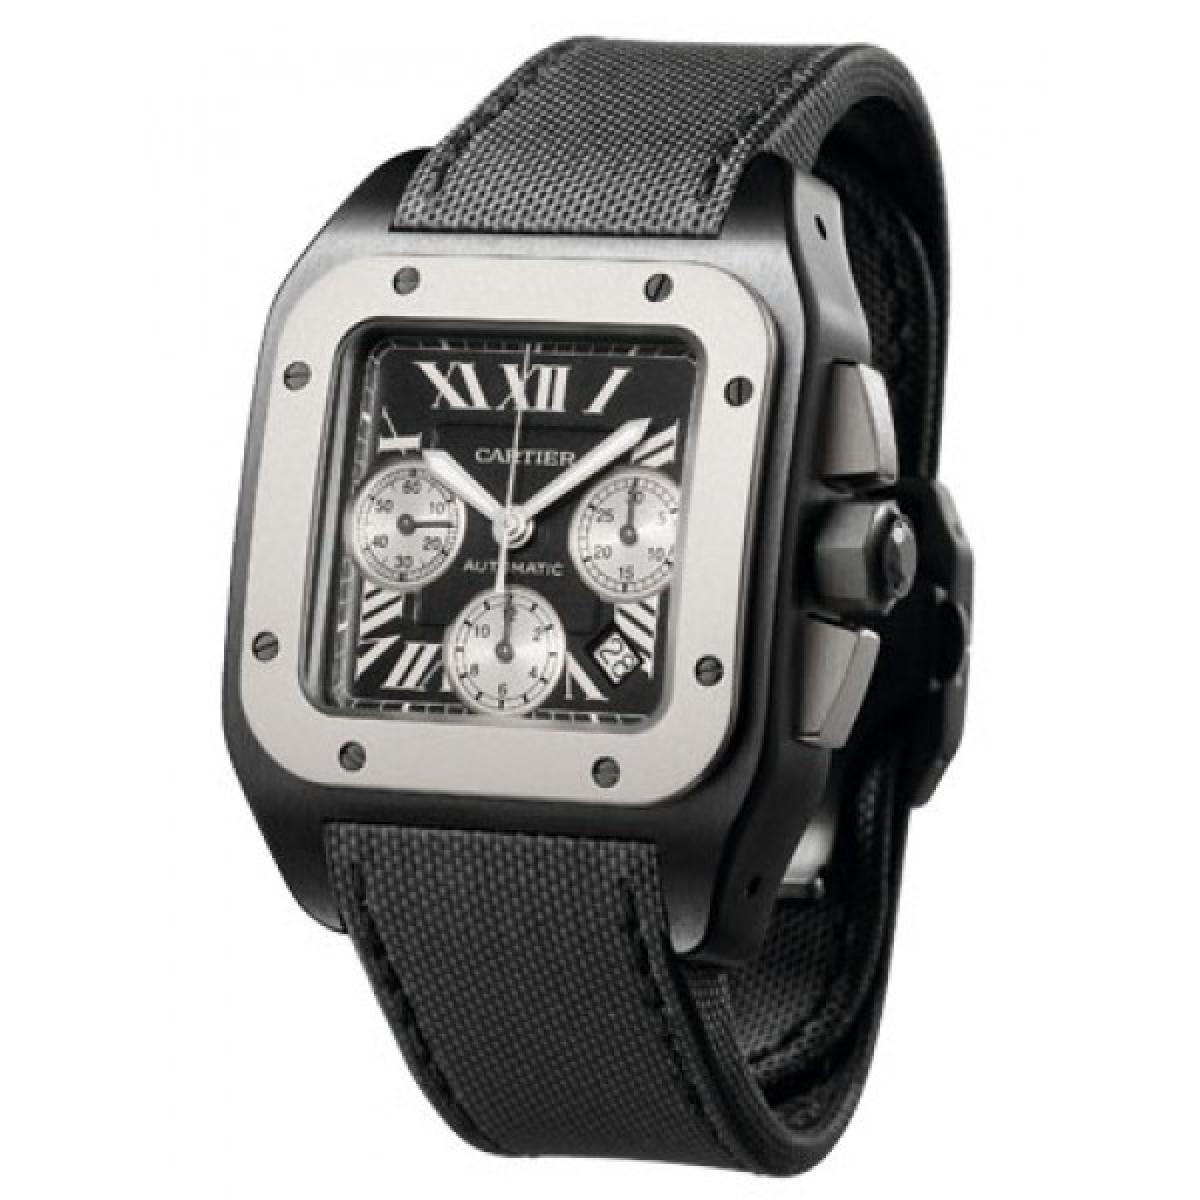 4747eb0b6fb Relógio Réplica Cartier Santos 100 Black Steel